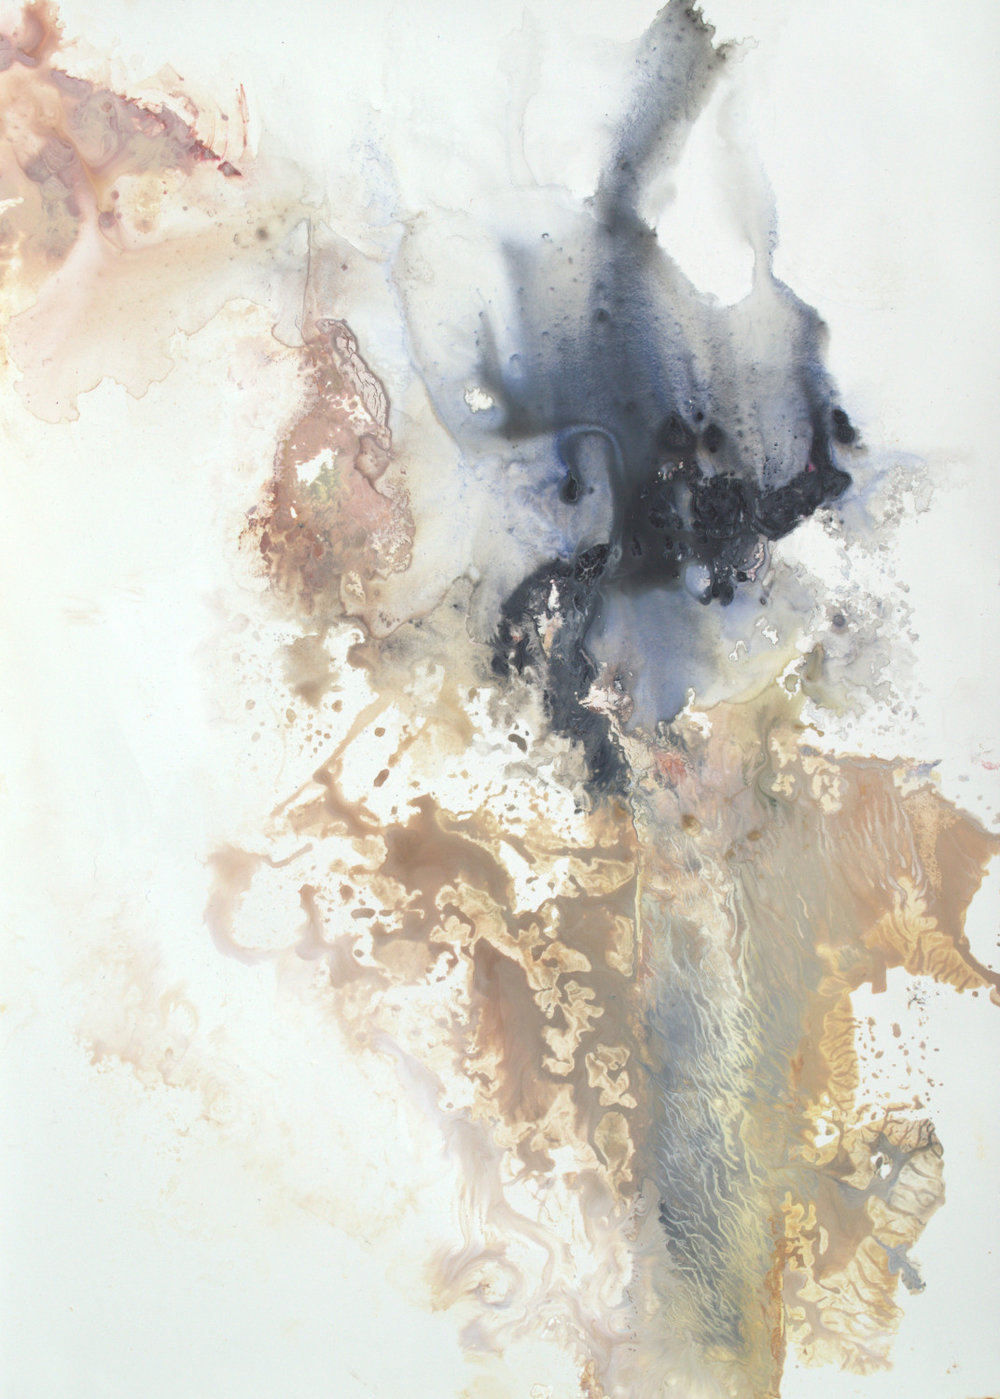 Abstract Organic Contrmporary IV - 12x9